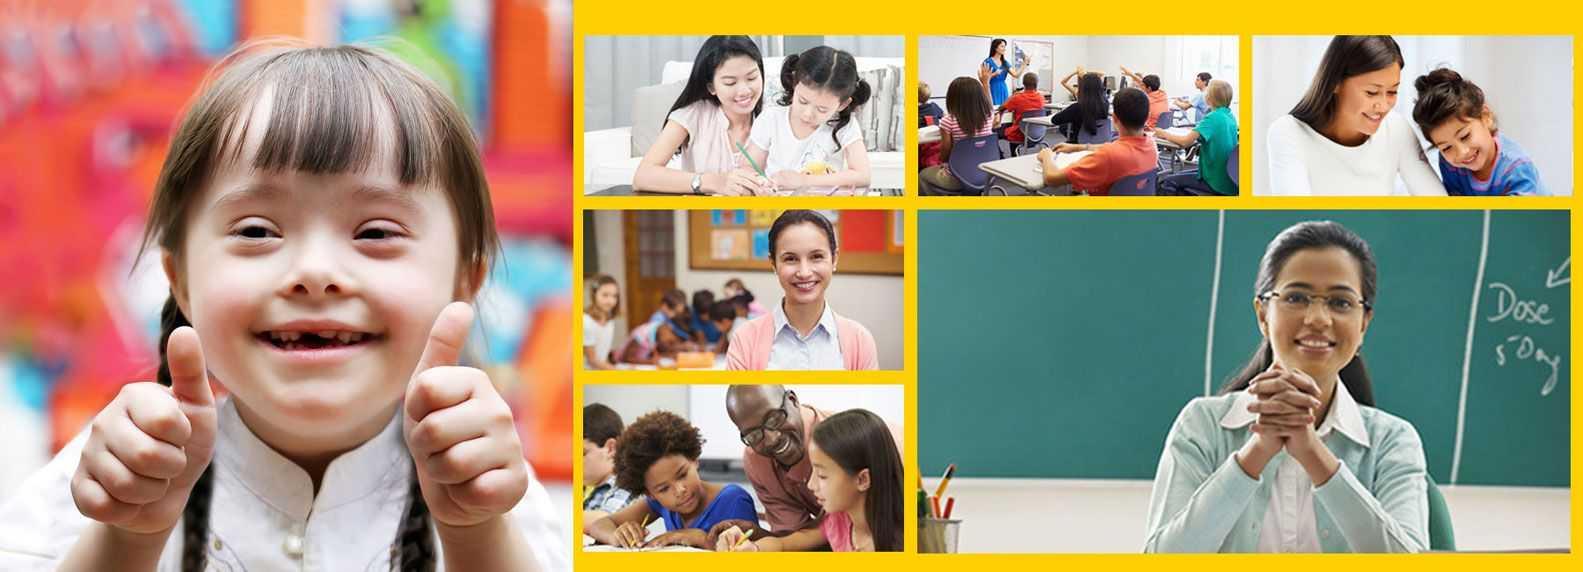 Special Education Teacher Training | ADHD Training Programs